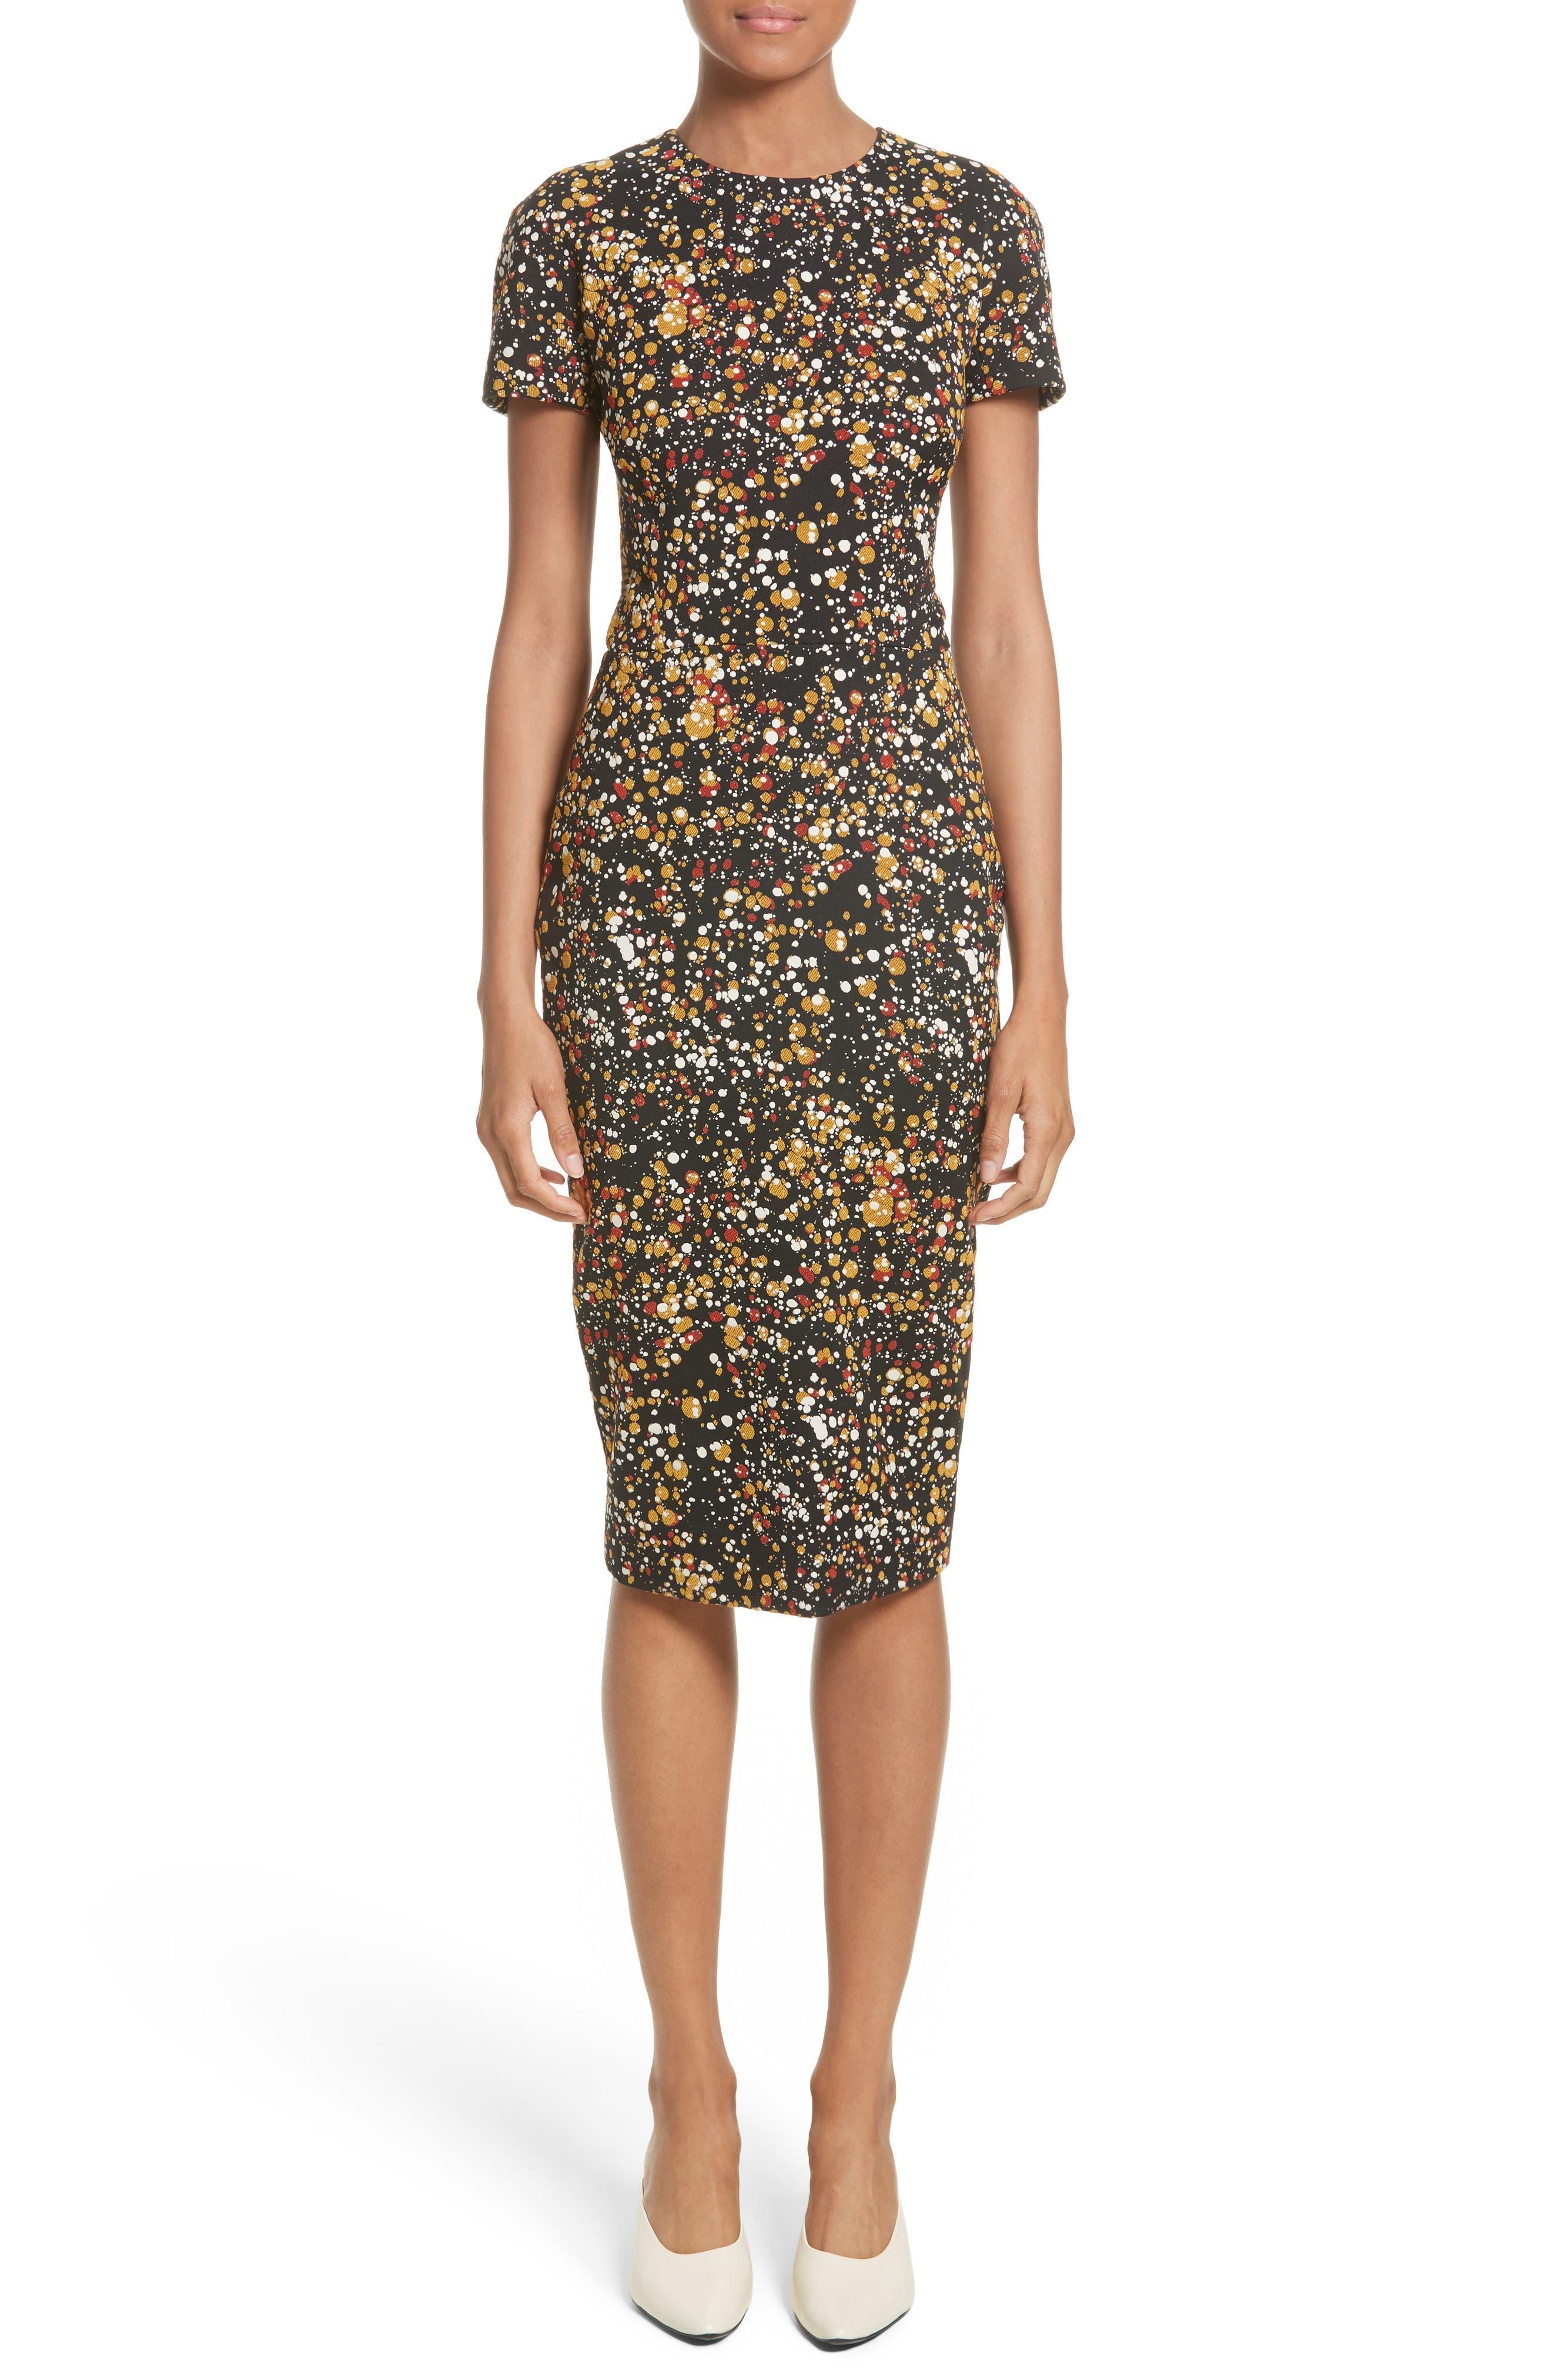 Marble Jacquard Dress,                         Main,                         color, Black/ Mustard/ Orange